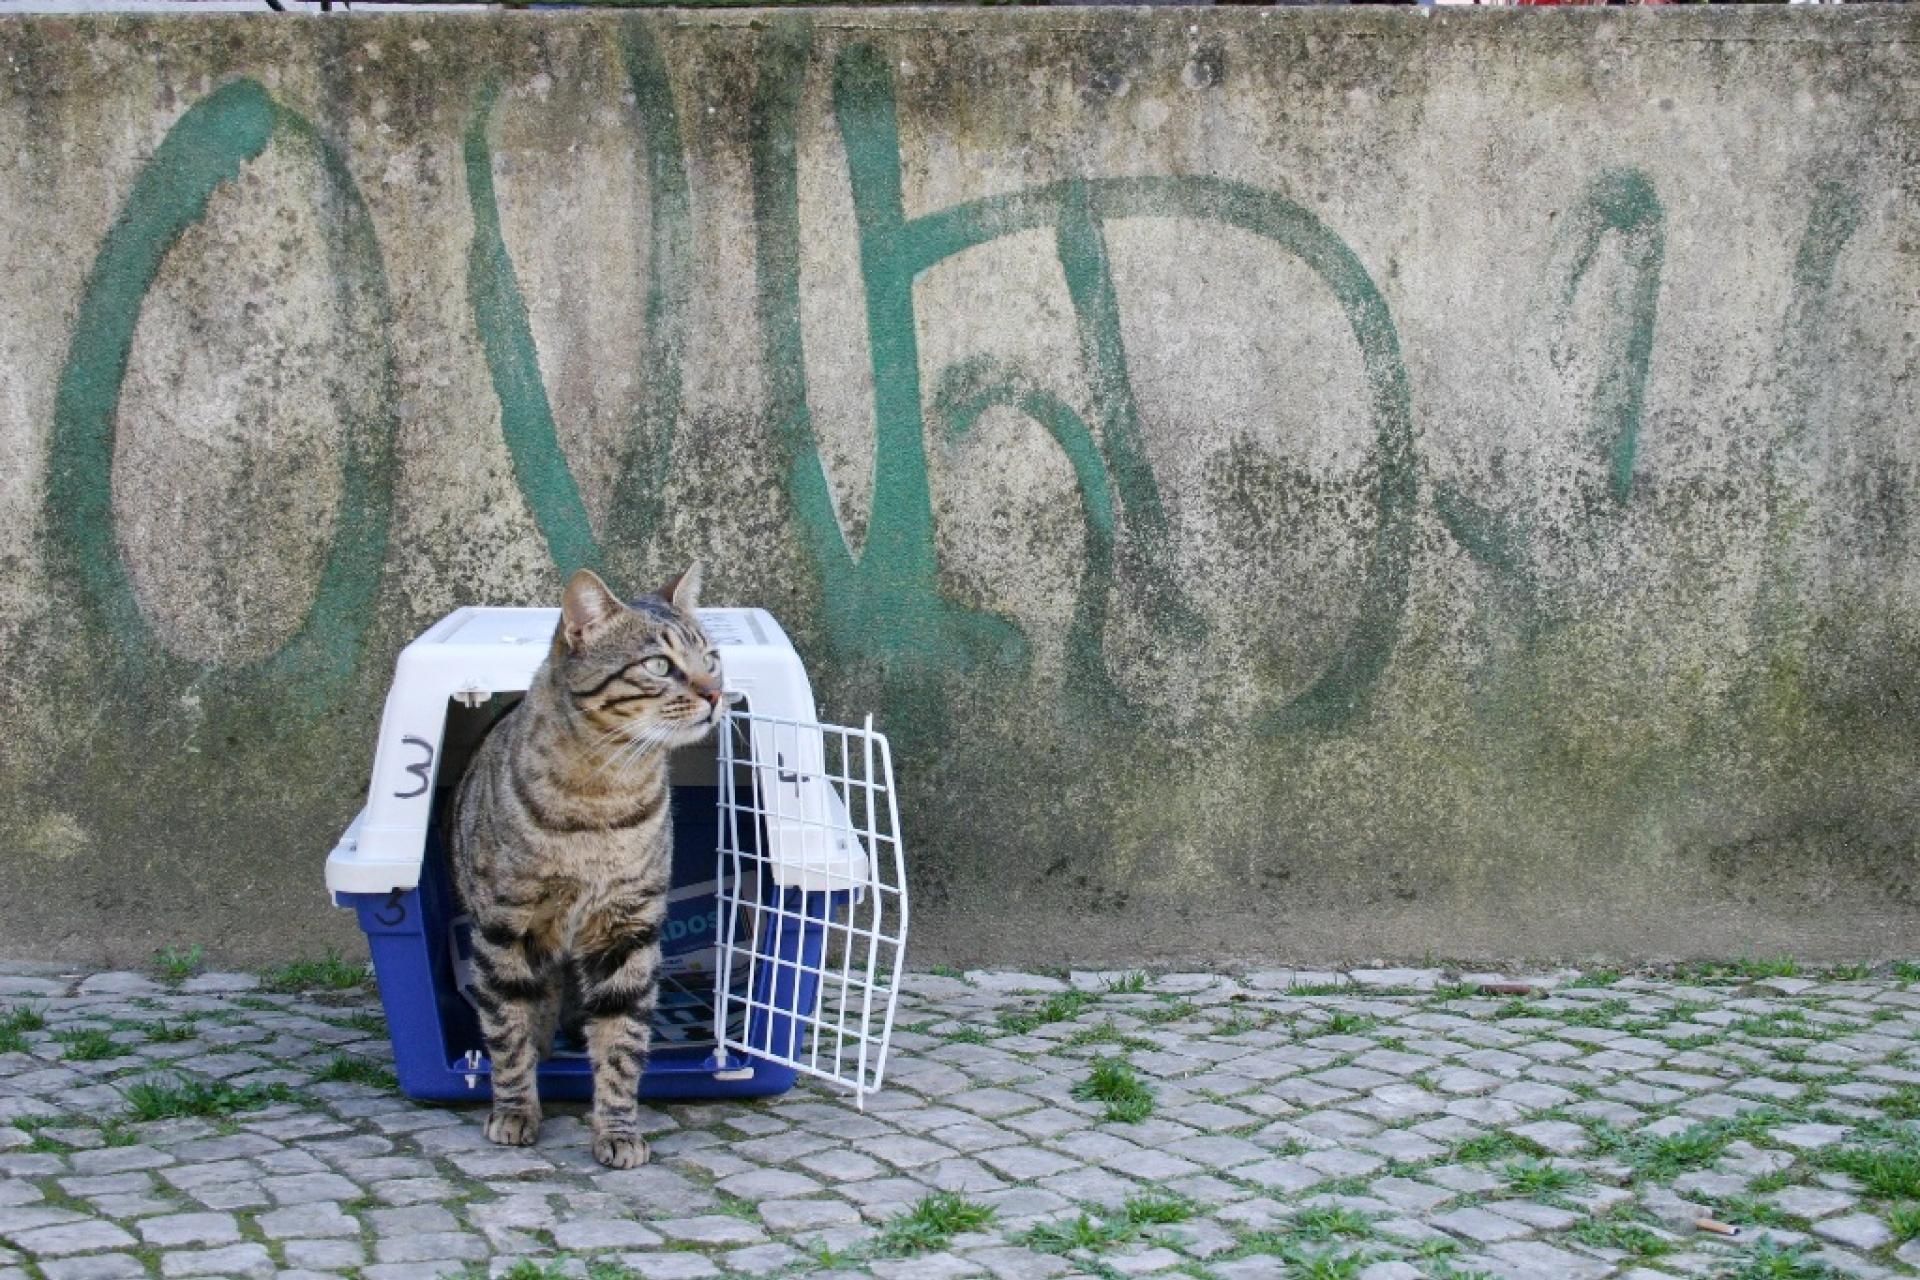 LisboaCool_Blog_Patrulha Gato - um projeto pioneiro